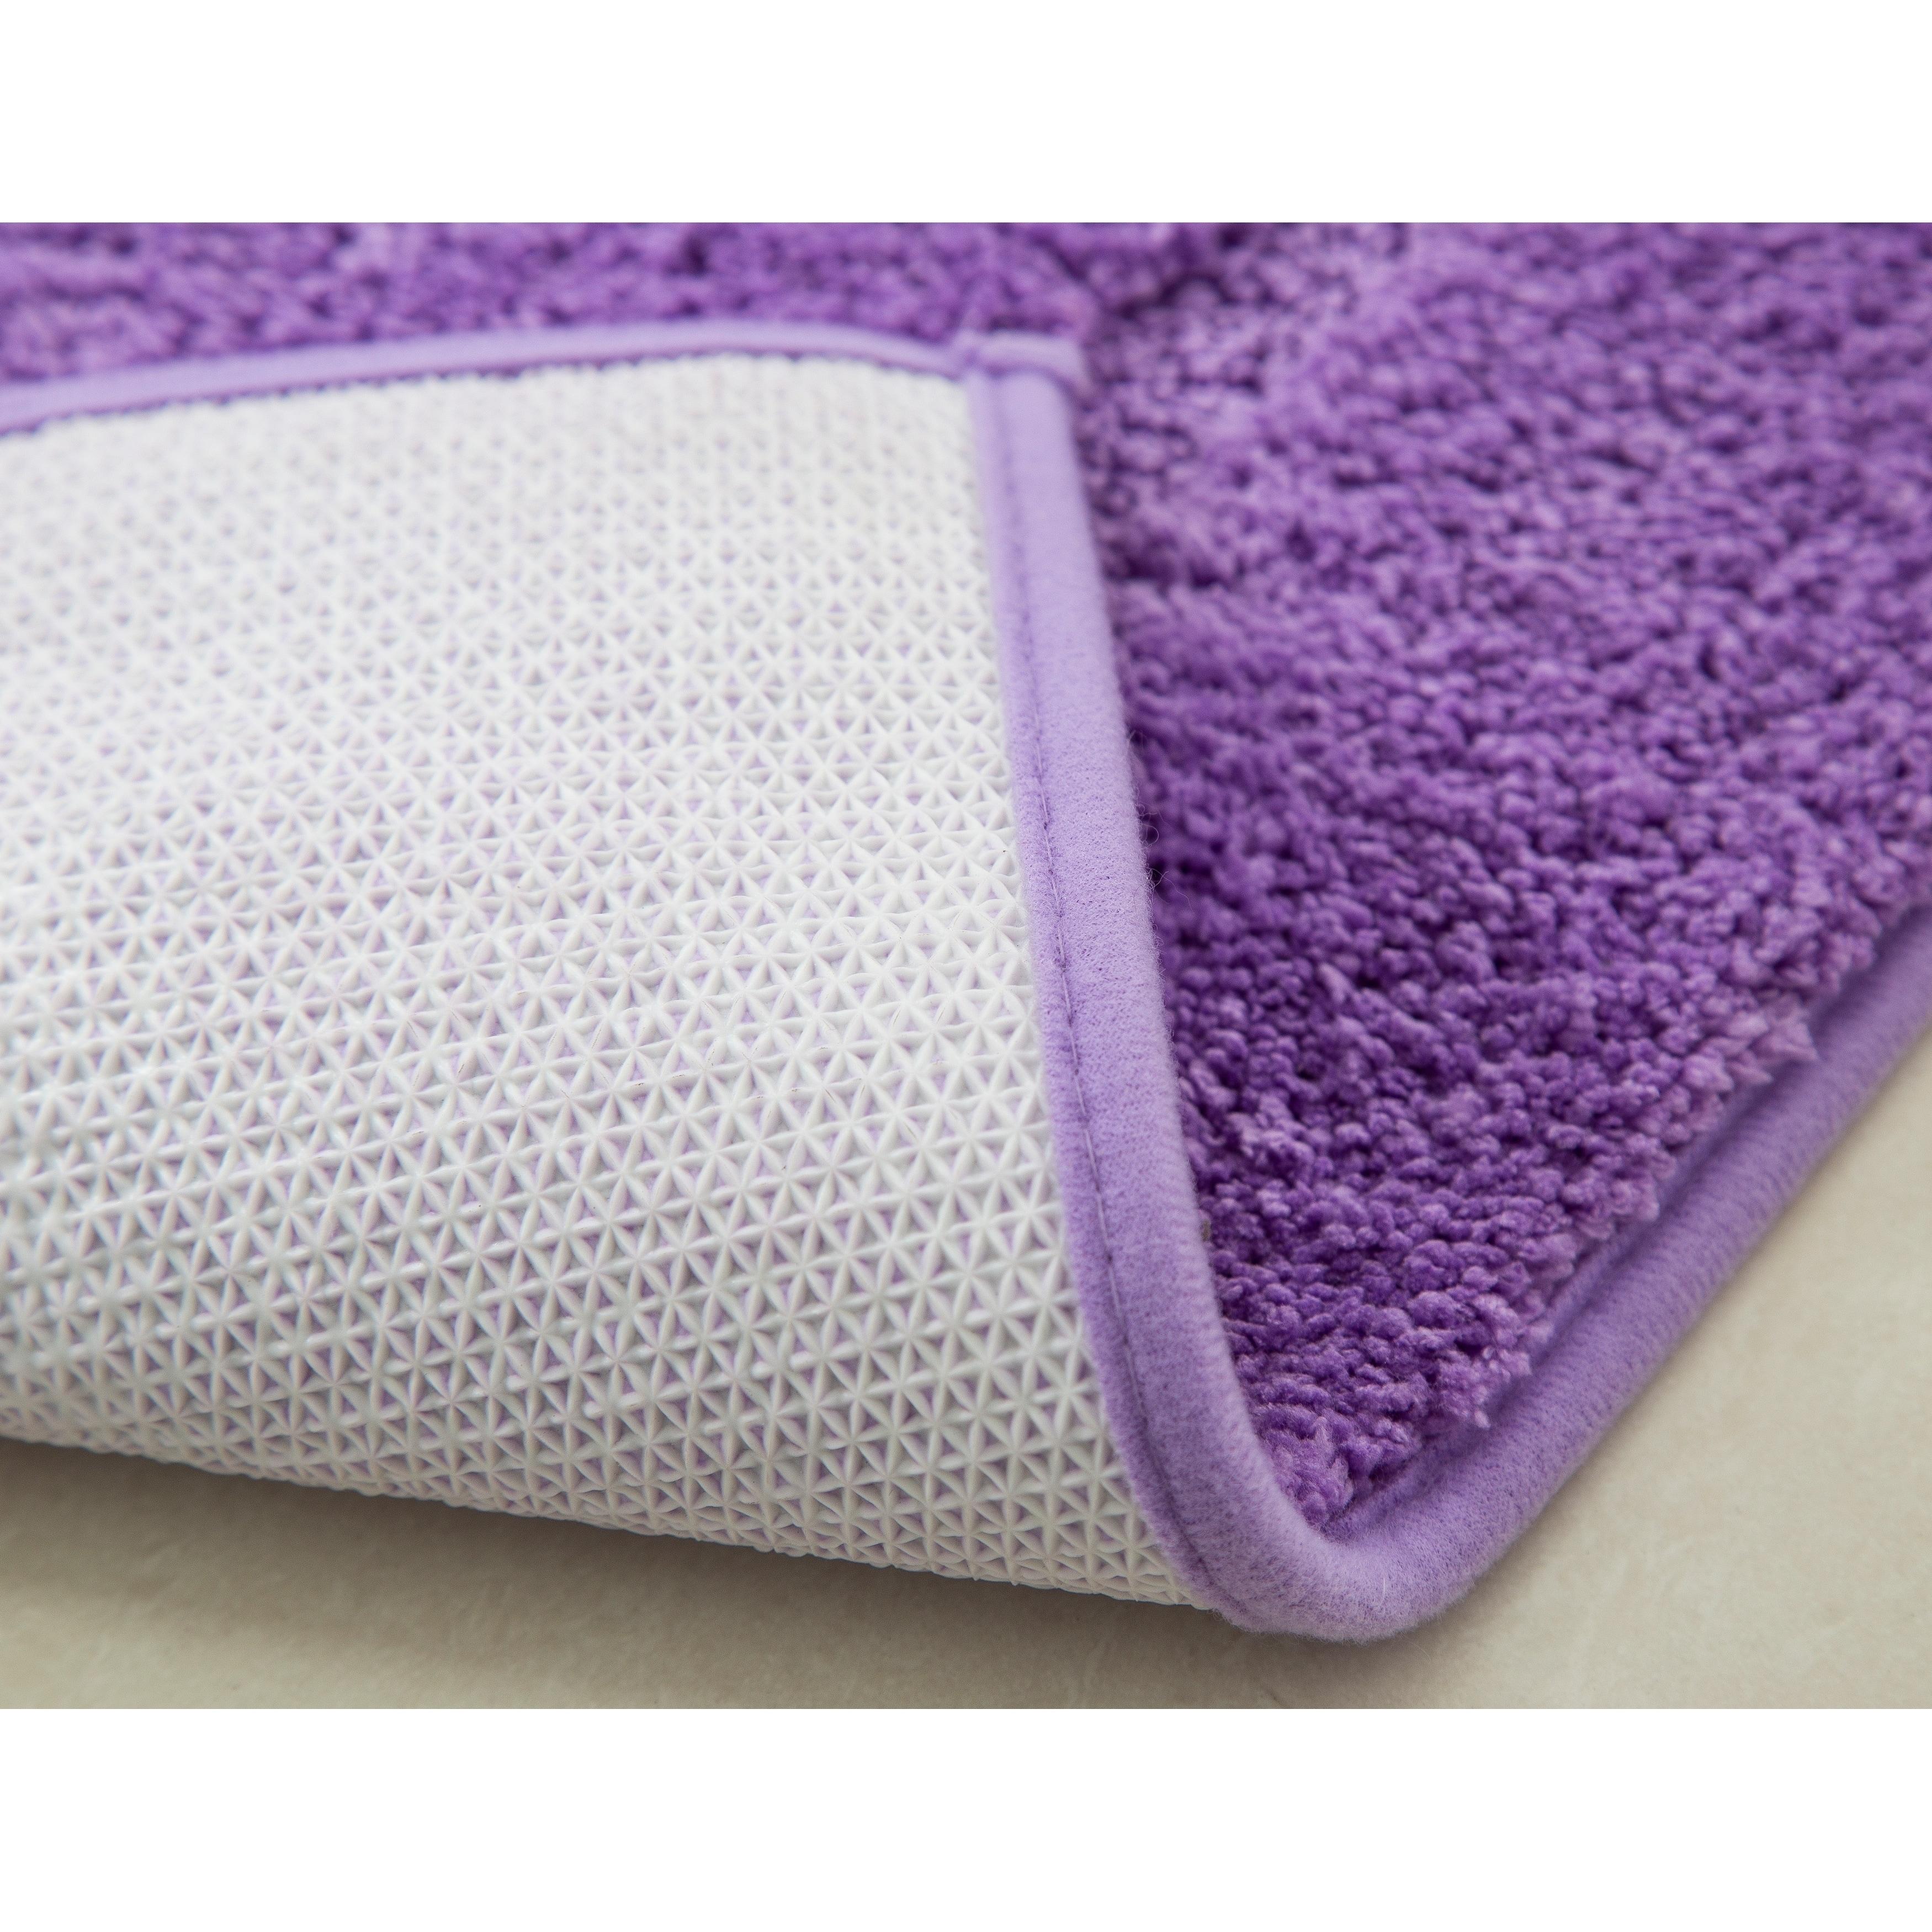 grey furnishings more purple mat views bath home mats